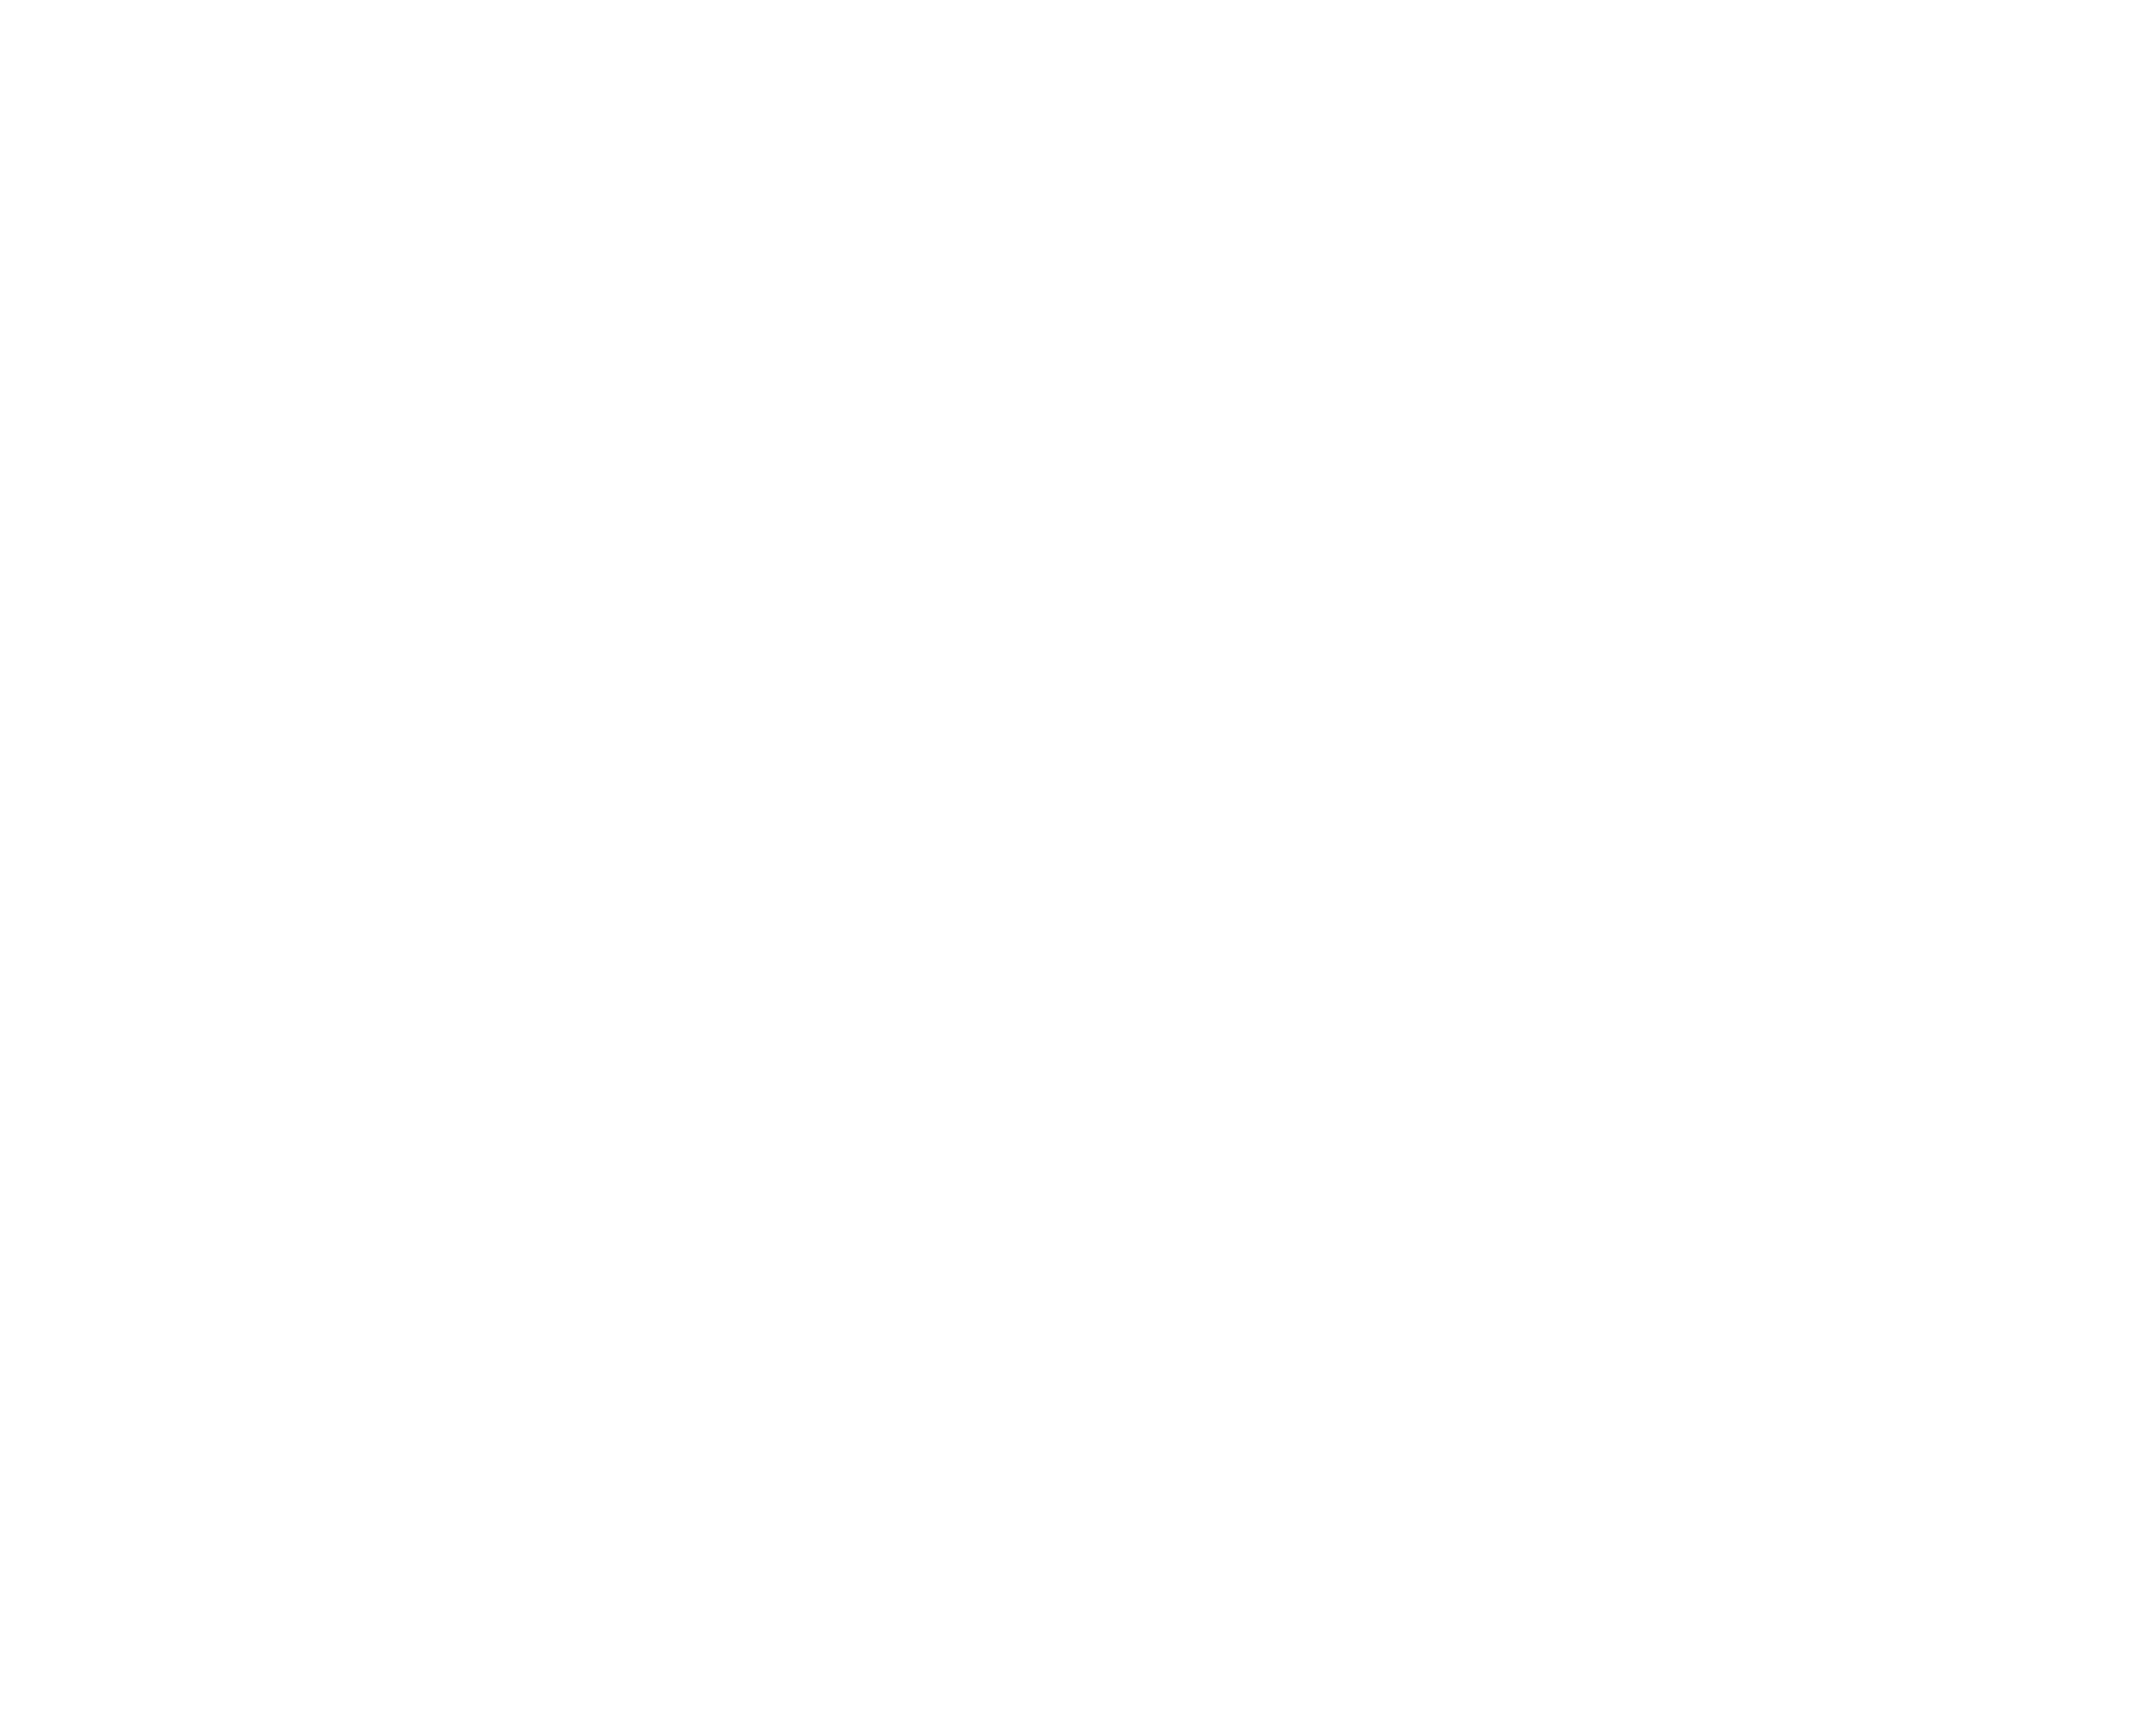 L'HEURE PHILO «L'ÉTERNEL FÉMININ: LEURRE OU VALEUR?» (AVEC GREGORY DARBADIE) – MARDI 24 AVRIL 2018 (19H00)